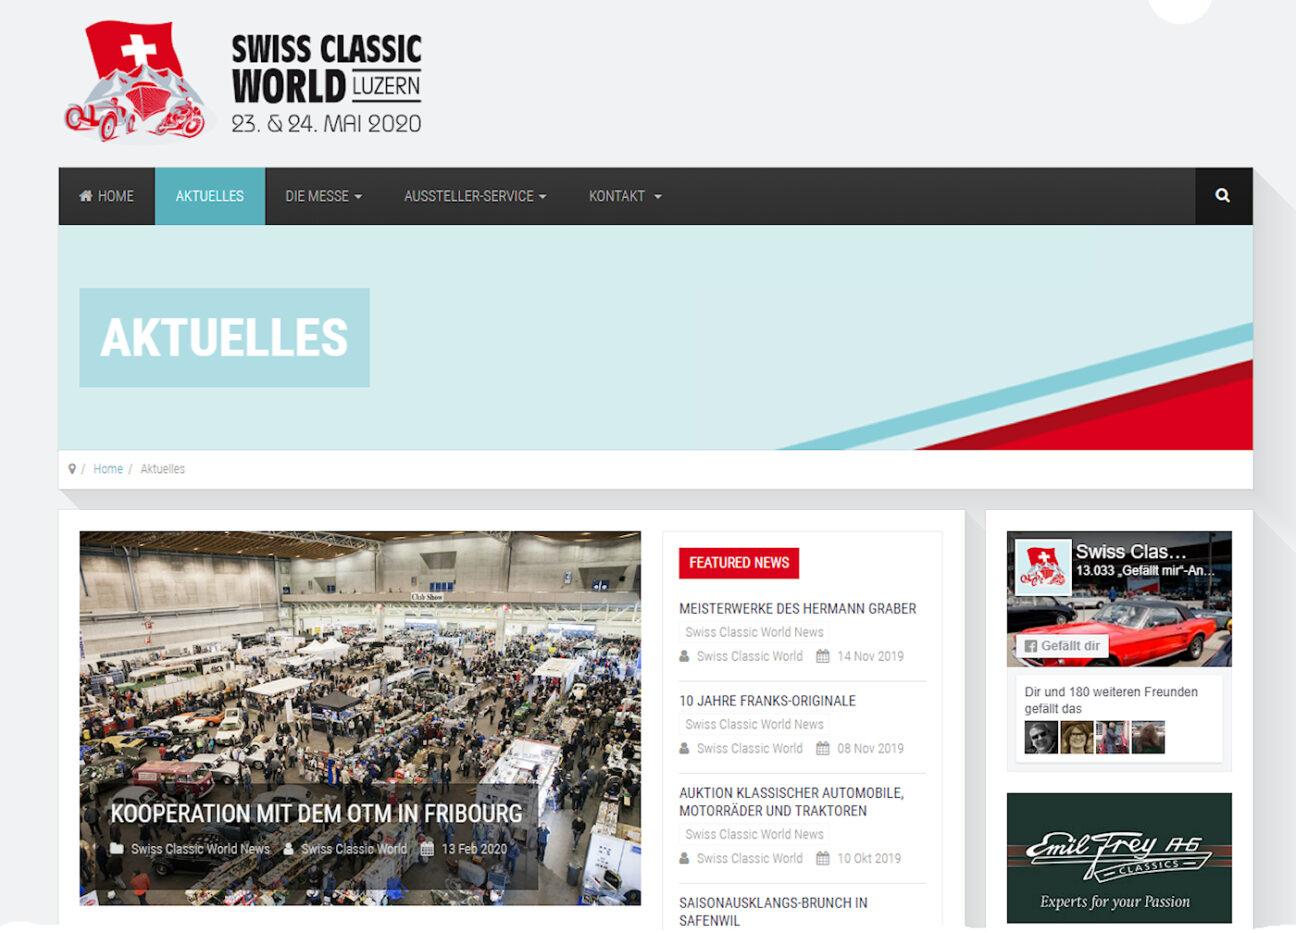 Swiss, Classic, World, Bernd, Link, 2020, OTM, Fribourg, Kooperation